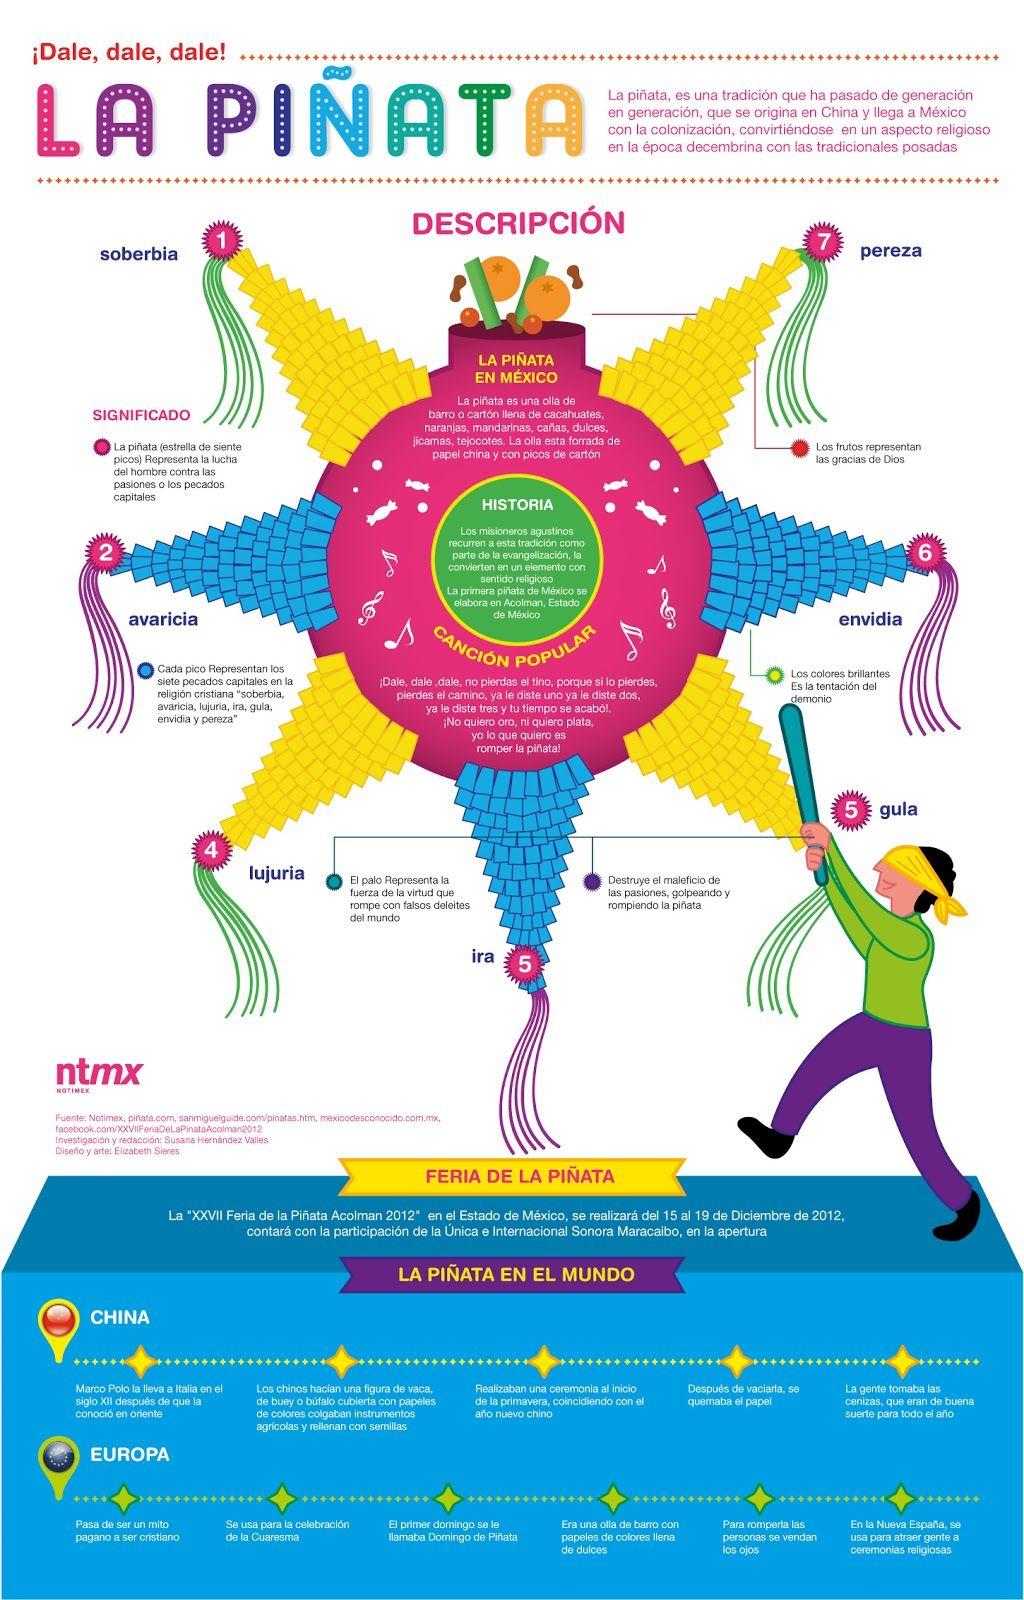 La Pinata Infografia Infographic Aula De Espanol Espanol De Escuela Primaria Pinatas